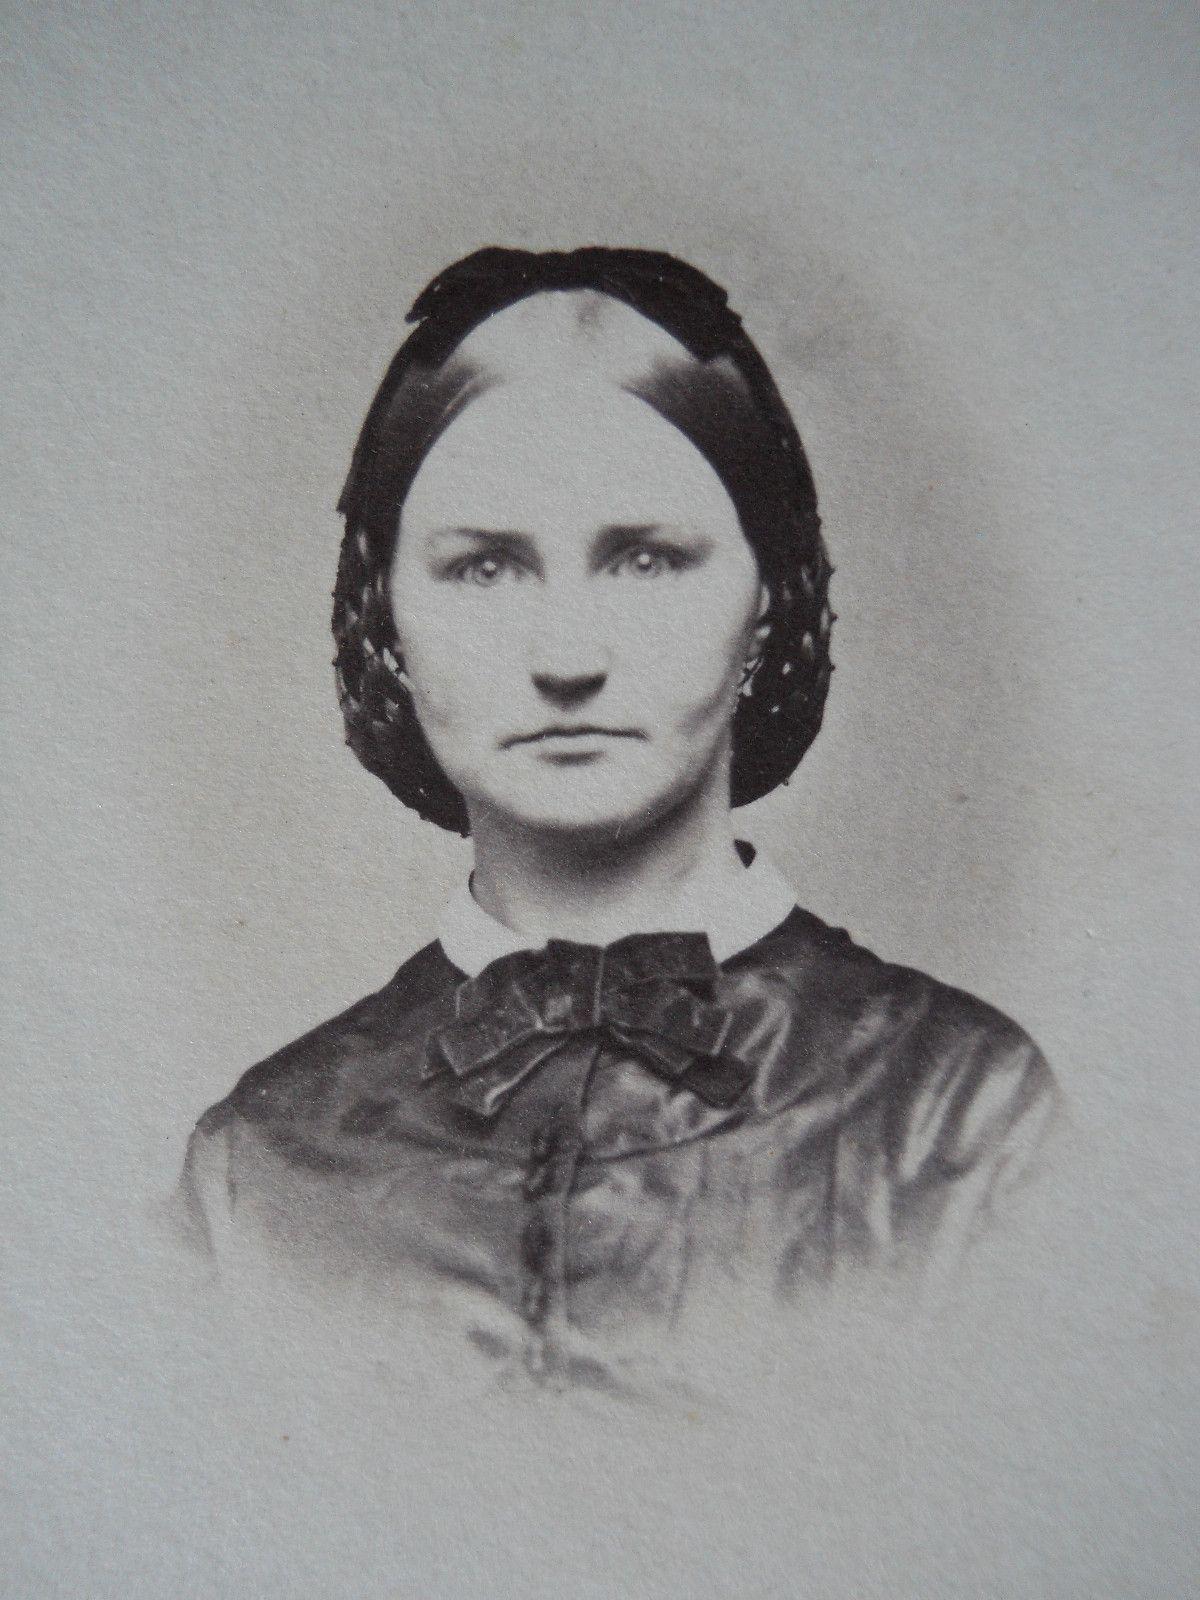 portrait beautiful lady hair snood antique civil war era cdv